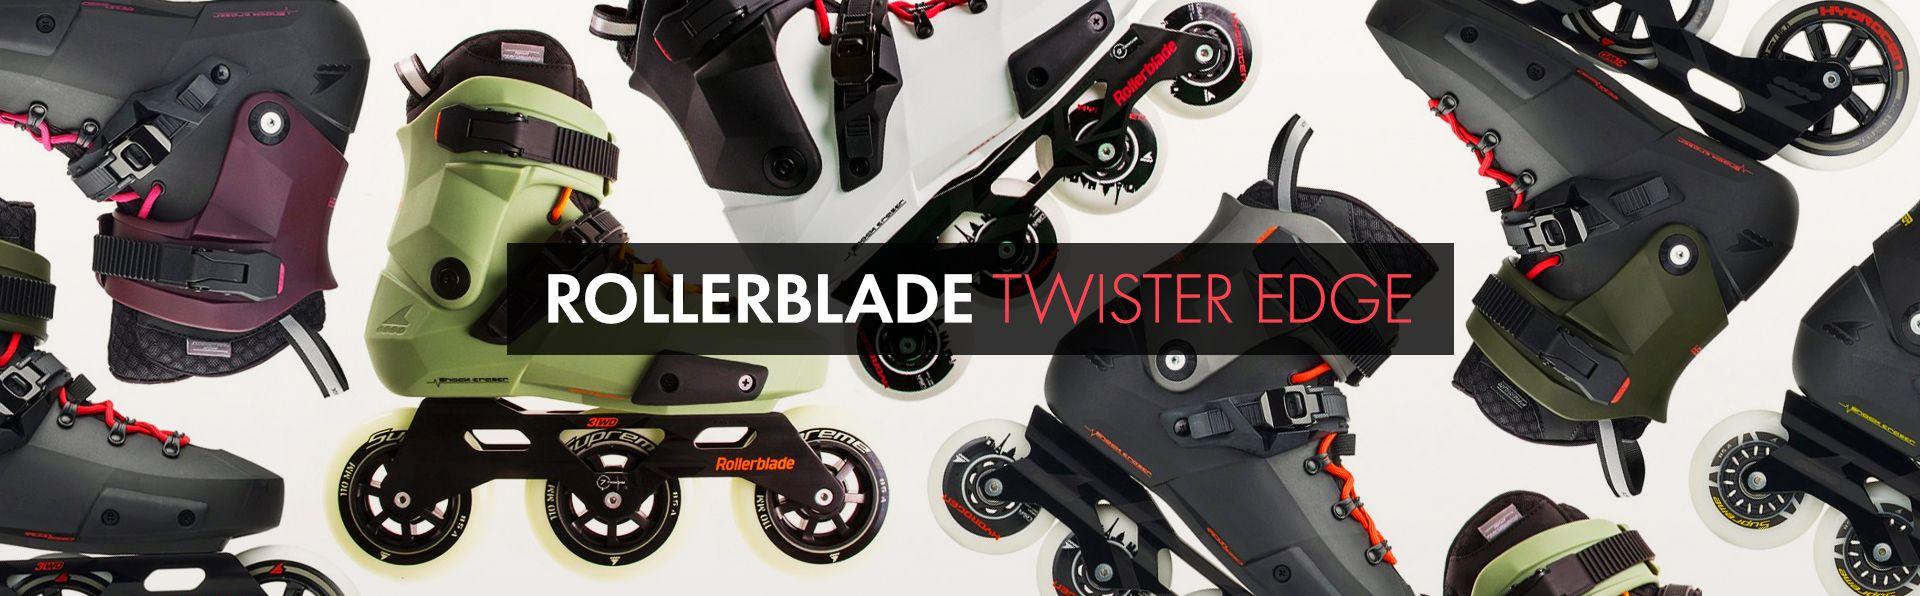 Rollerblade - Twister Edge